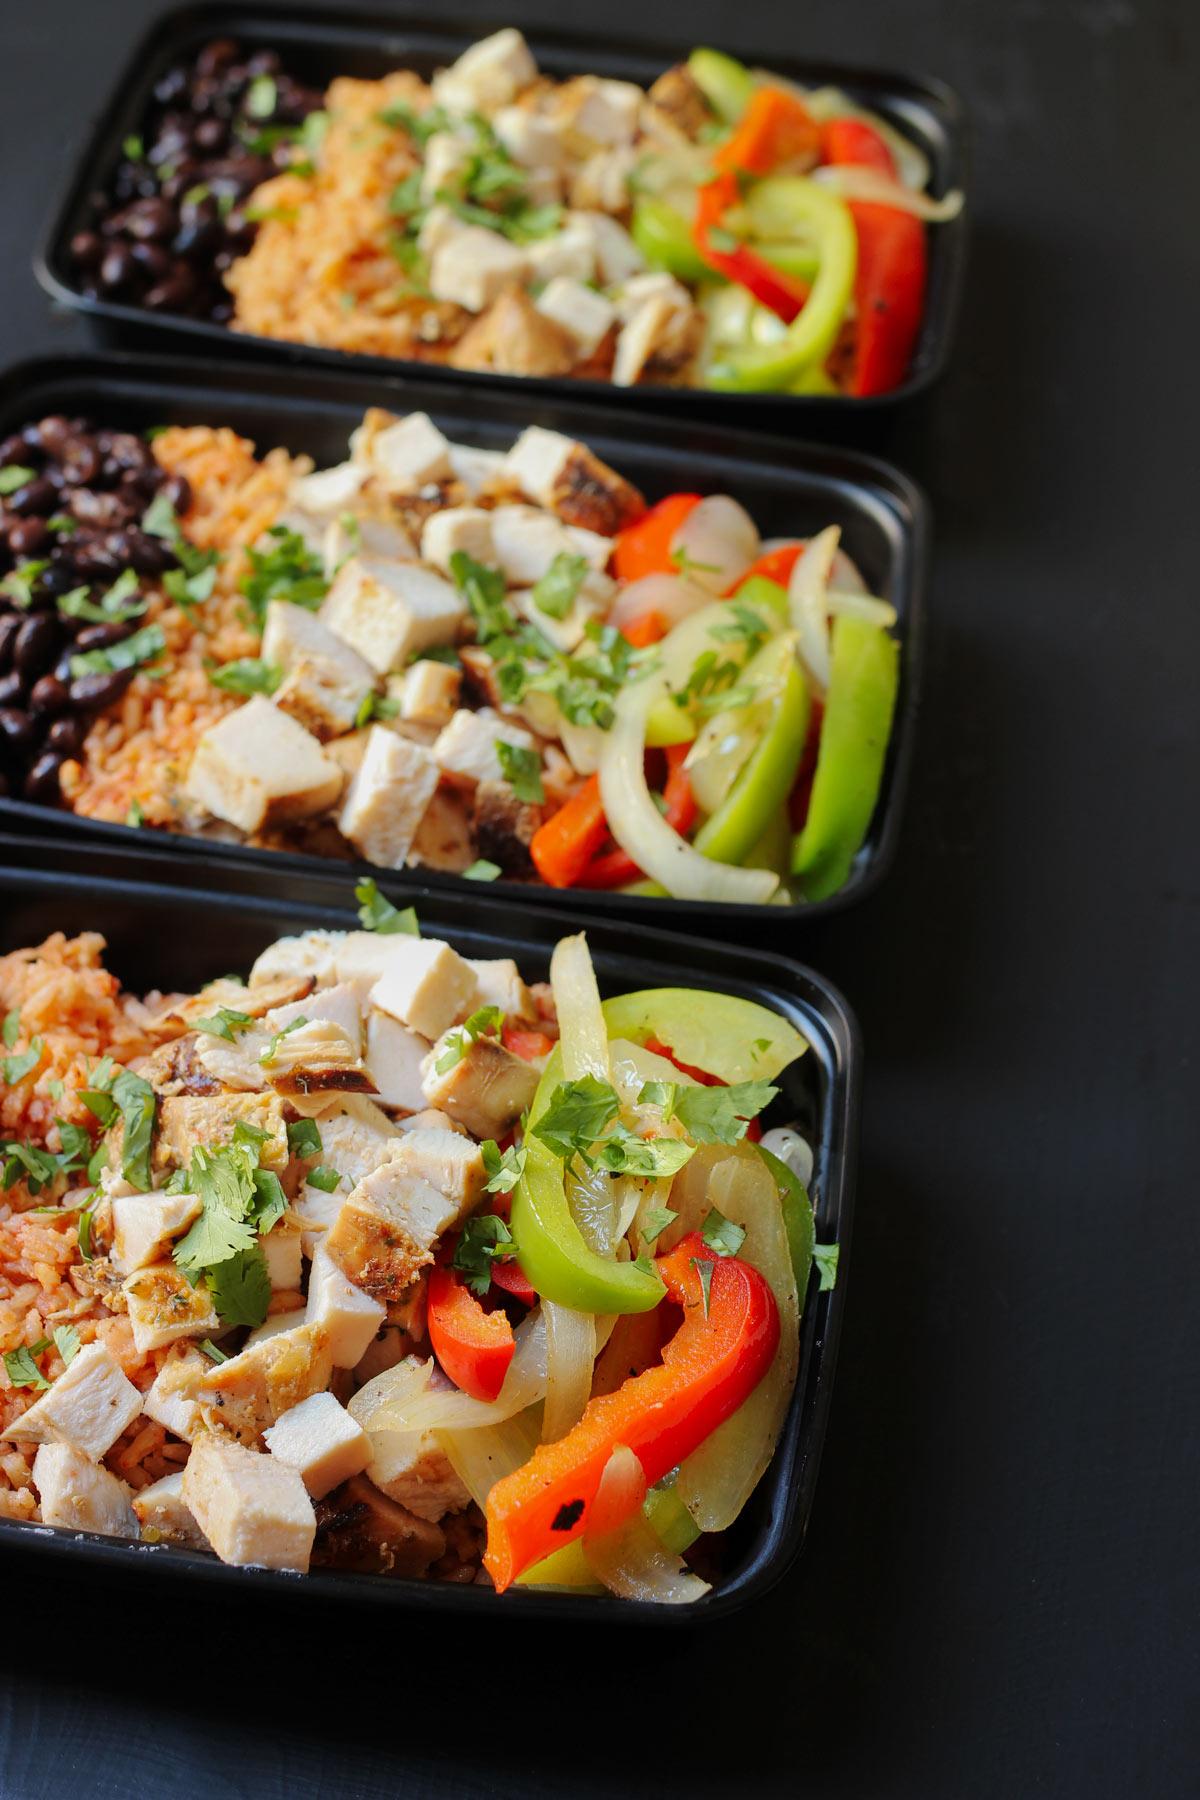 meal prep boxes with fajita burrito bowls assembled.